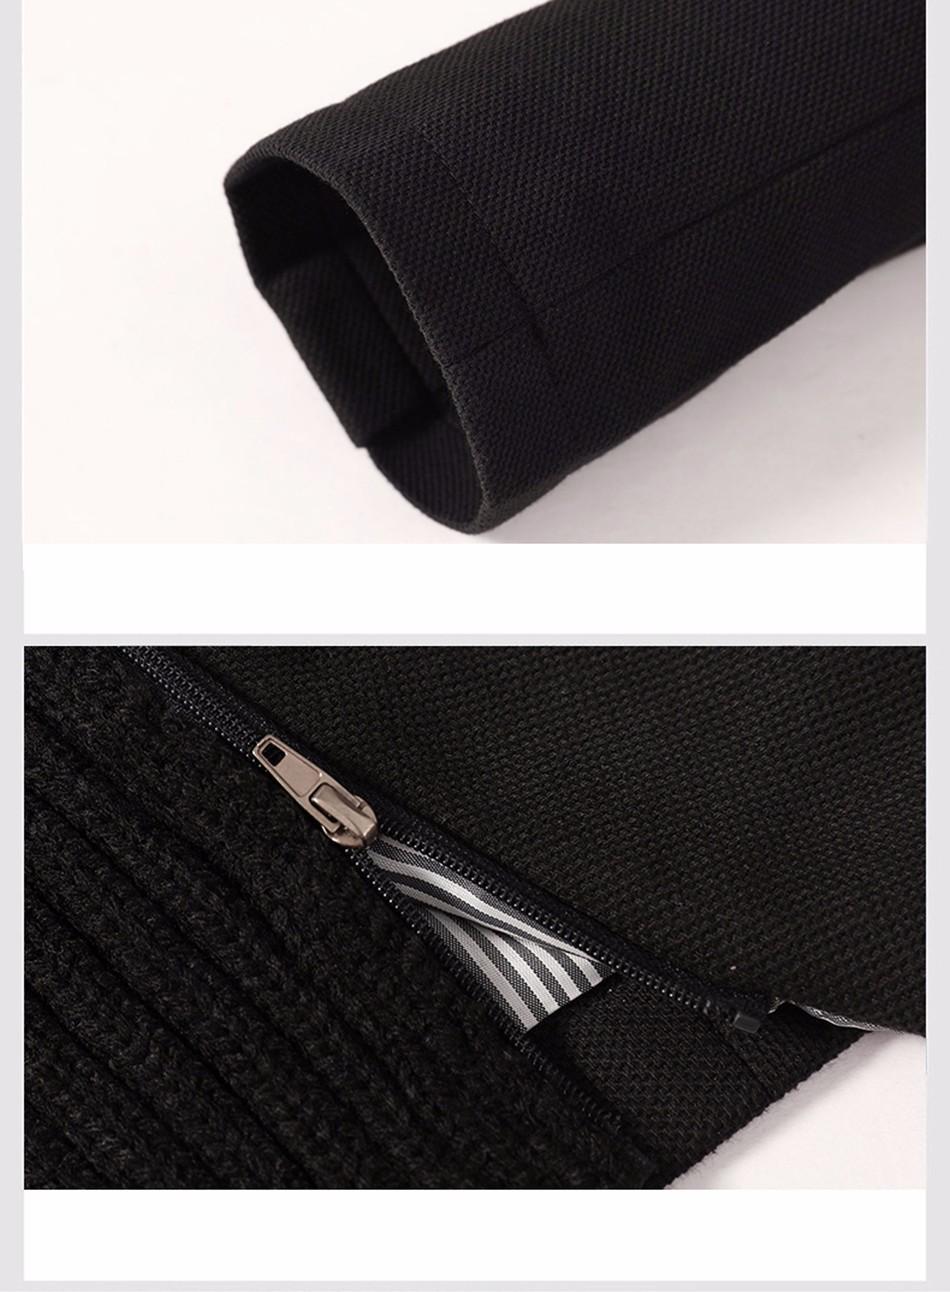 HTB1bzesOVXXXXcIXFXXq6xXFXXXi - Men Casual Warm Coats Size M-3XL Good Quality Single Breasted Design Thicken Men's Fashion Wool Clothings Lapel Design hsd-J316